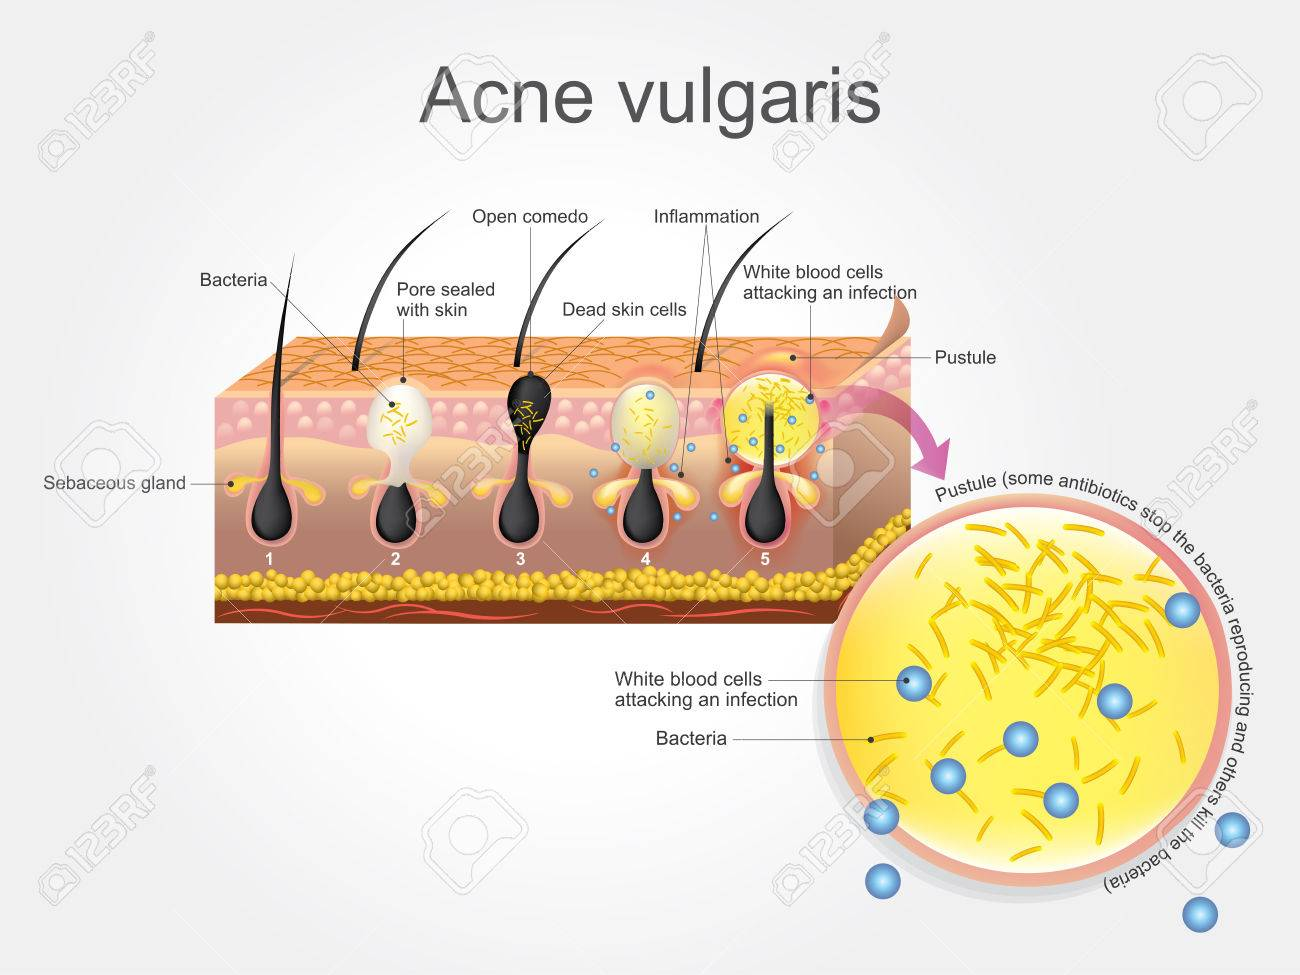 http://n3.datasn.io/data/api/v1/n3zm/image_of_skin_disease_5/by_table/skin_disease_image_download_access/08/af/a2/44/08afa244ea7ee1d3dd20eabd2283503fd06993bc.jpg